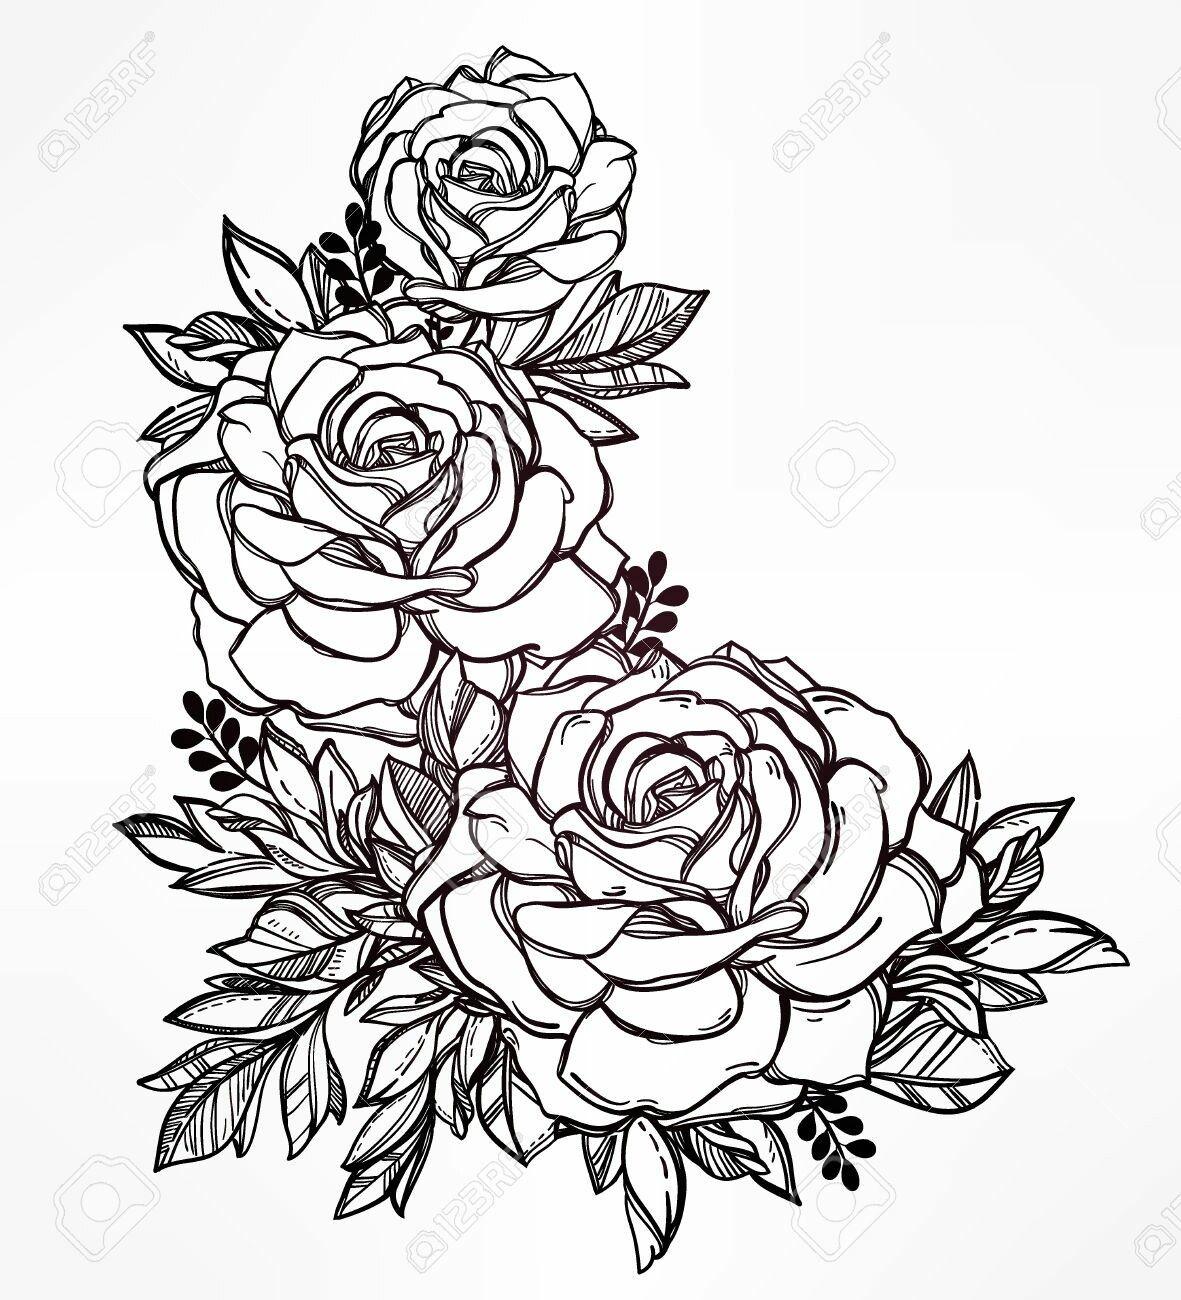 Cool Art Hip Tattoo Designs Rose Tattoos Hip Tattoo